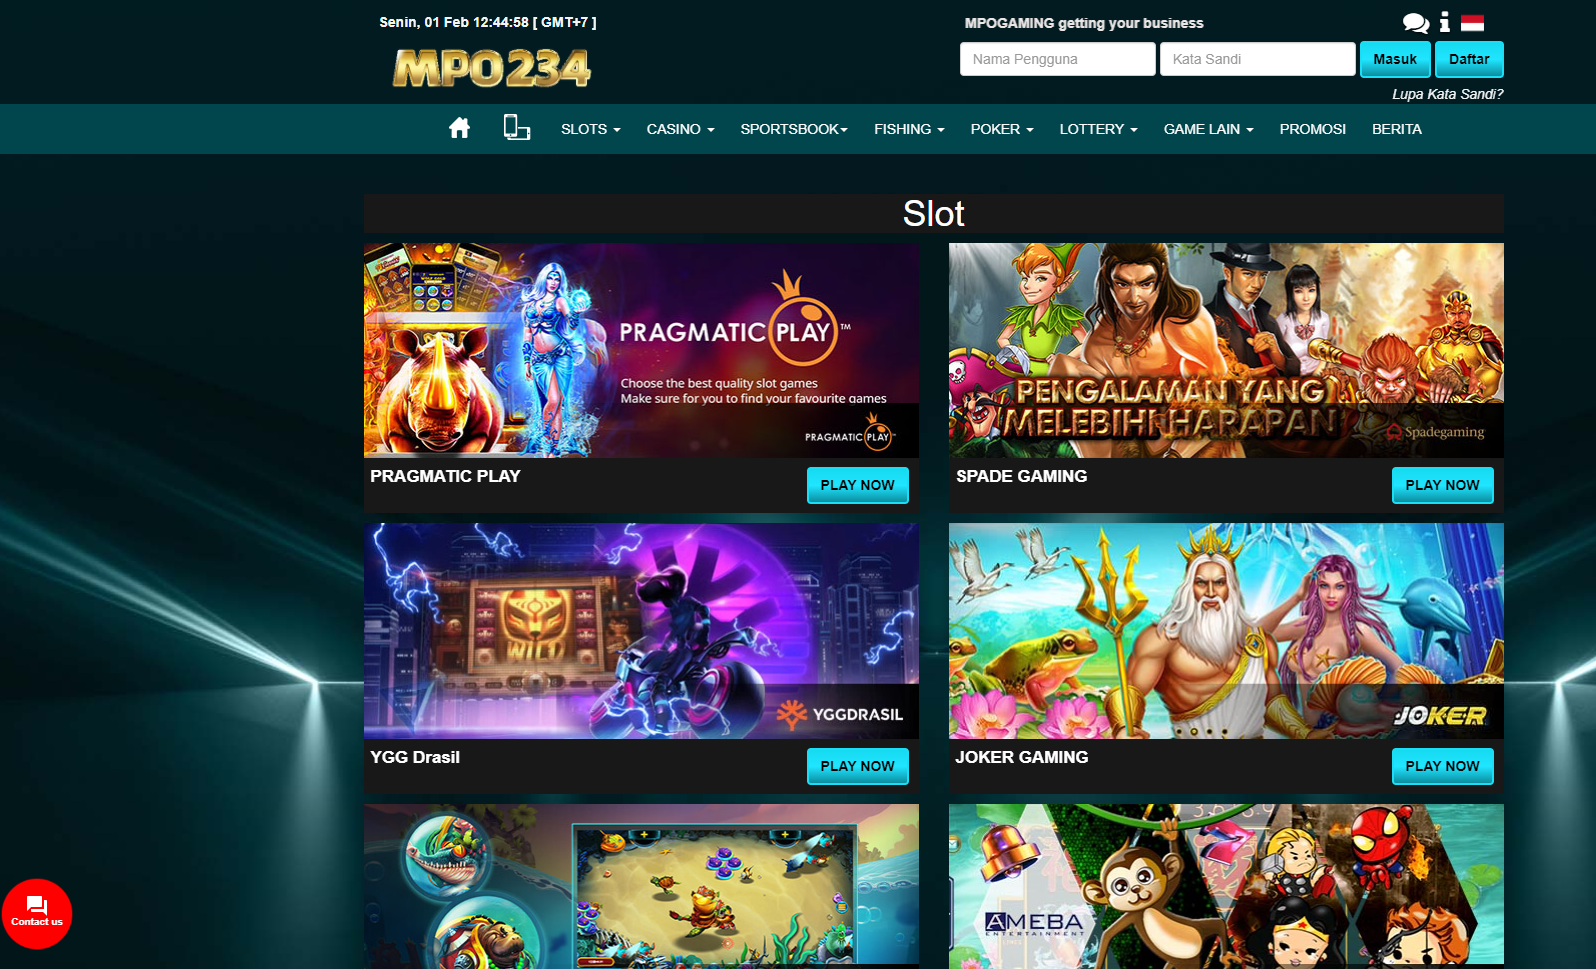 Mpo234 Bandar Judi Slot Online Playstar Indonesia Profile Francis Scott Key Elementary School Forum